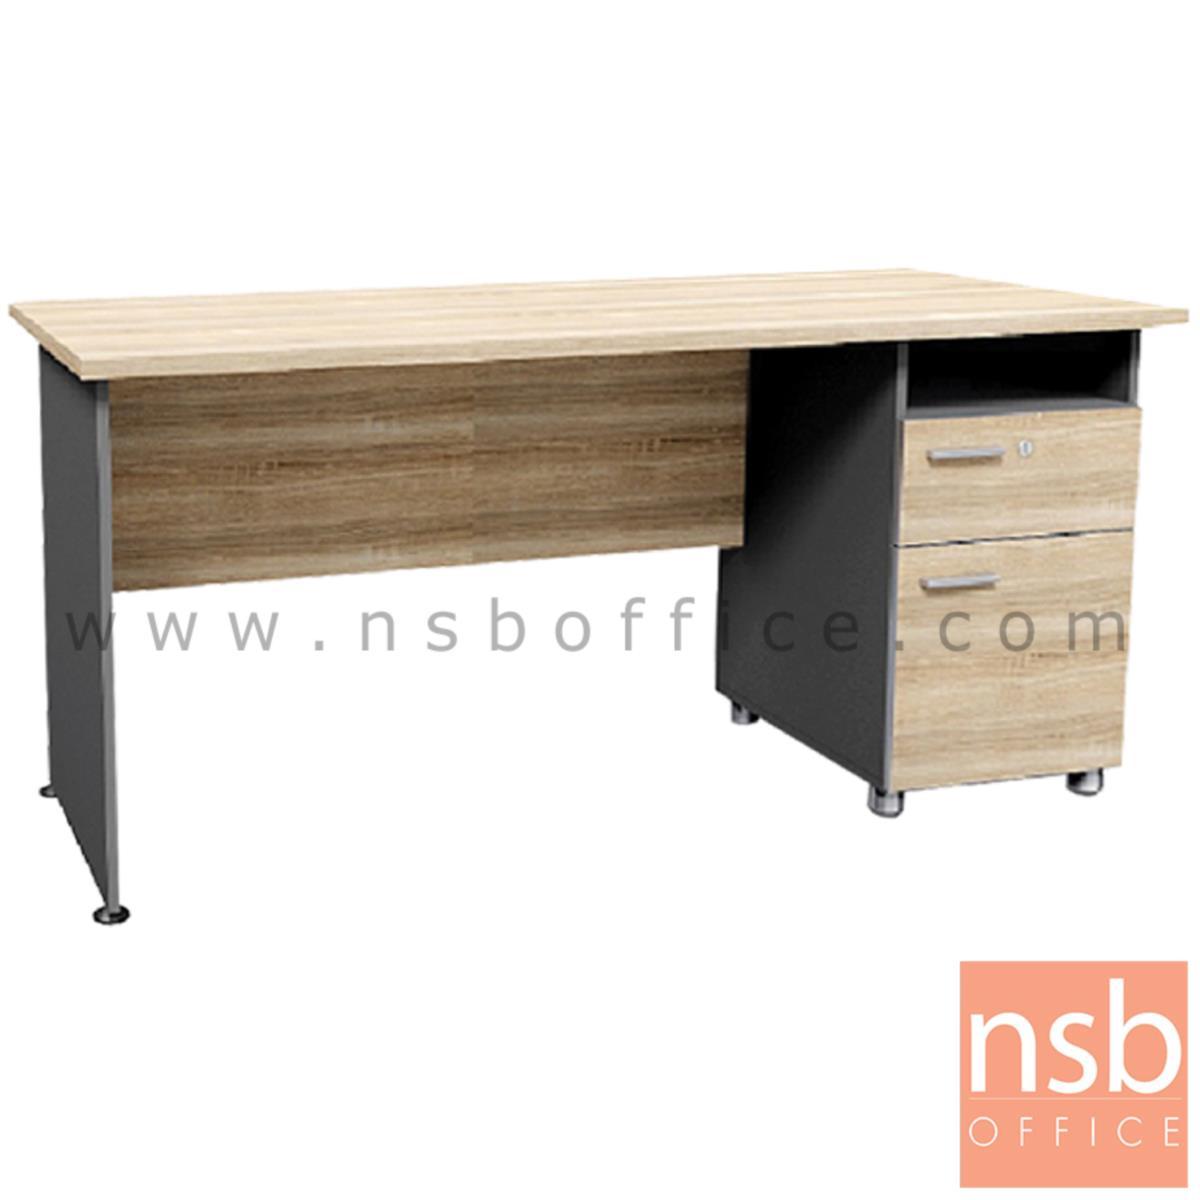 A13A194:โต๊ะทำงาน 2 ลิ้นชัก 1 ช่องโล่ง  รุ่น DKK-1602  ขนาด 160W cm. สีแกรนโอ๊คตัดกราไฟท์